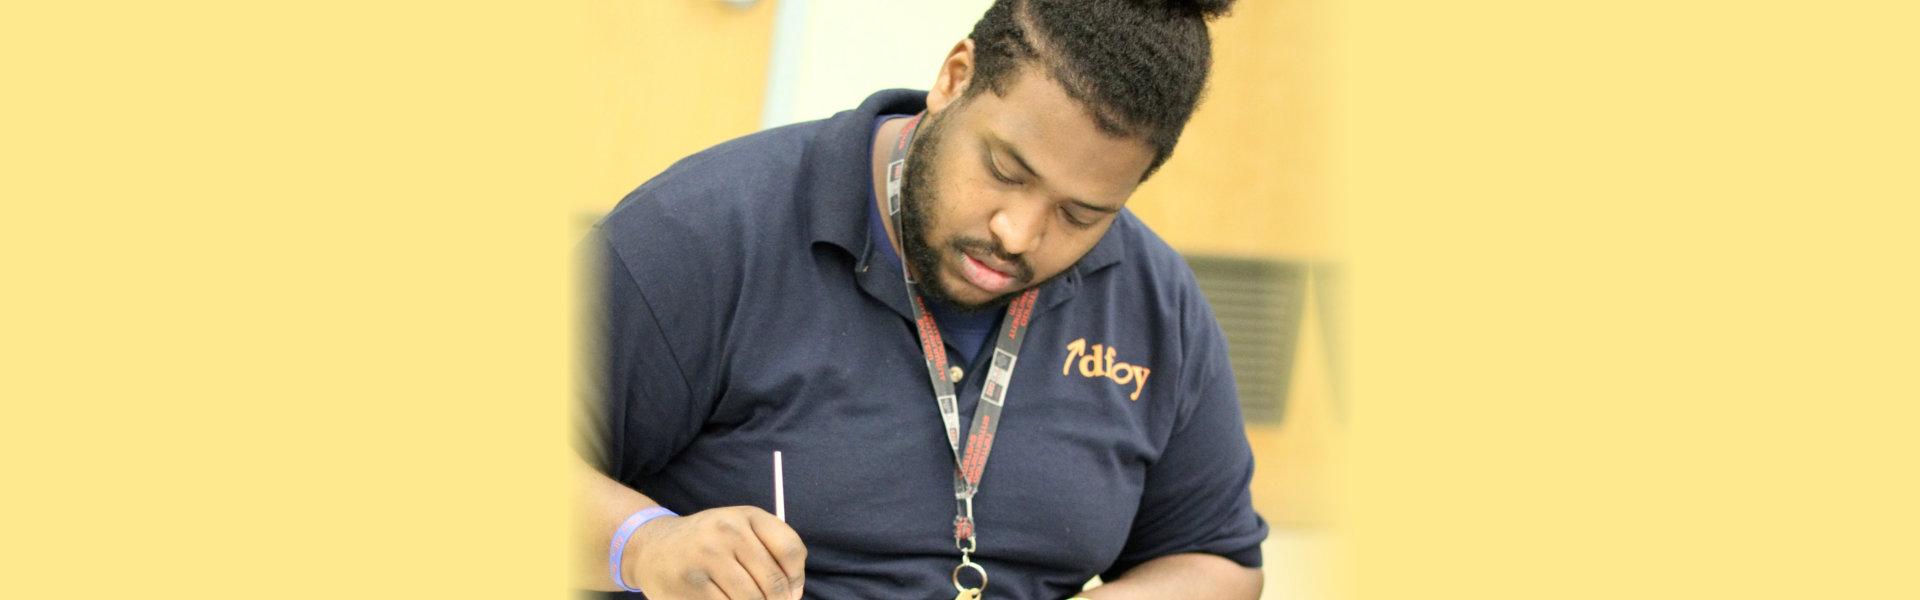 guy writting